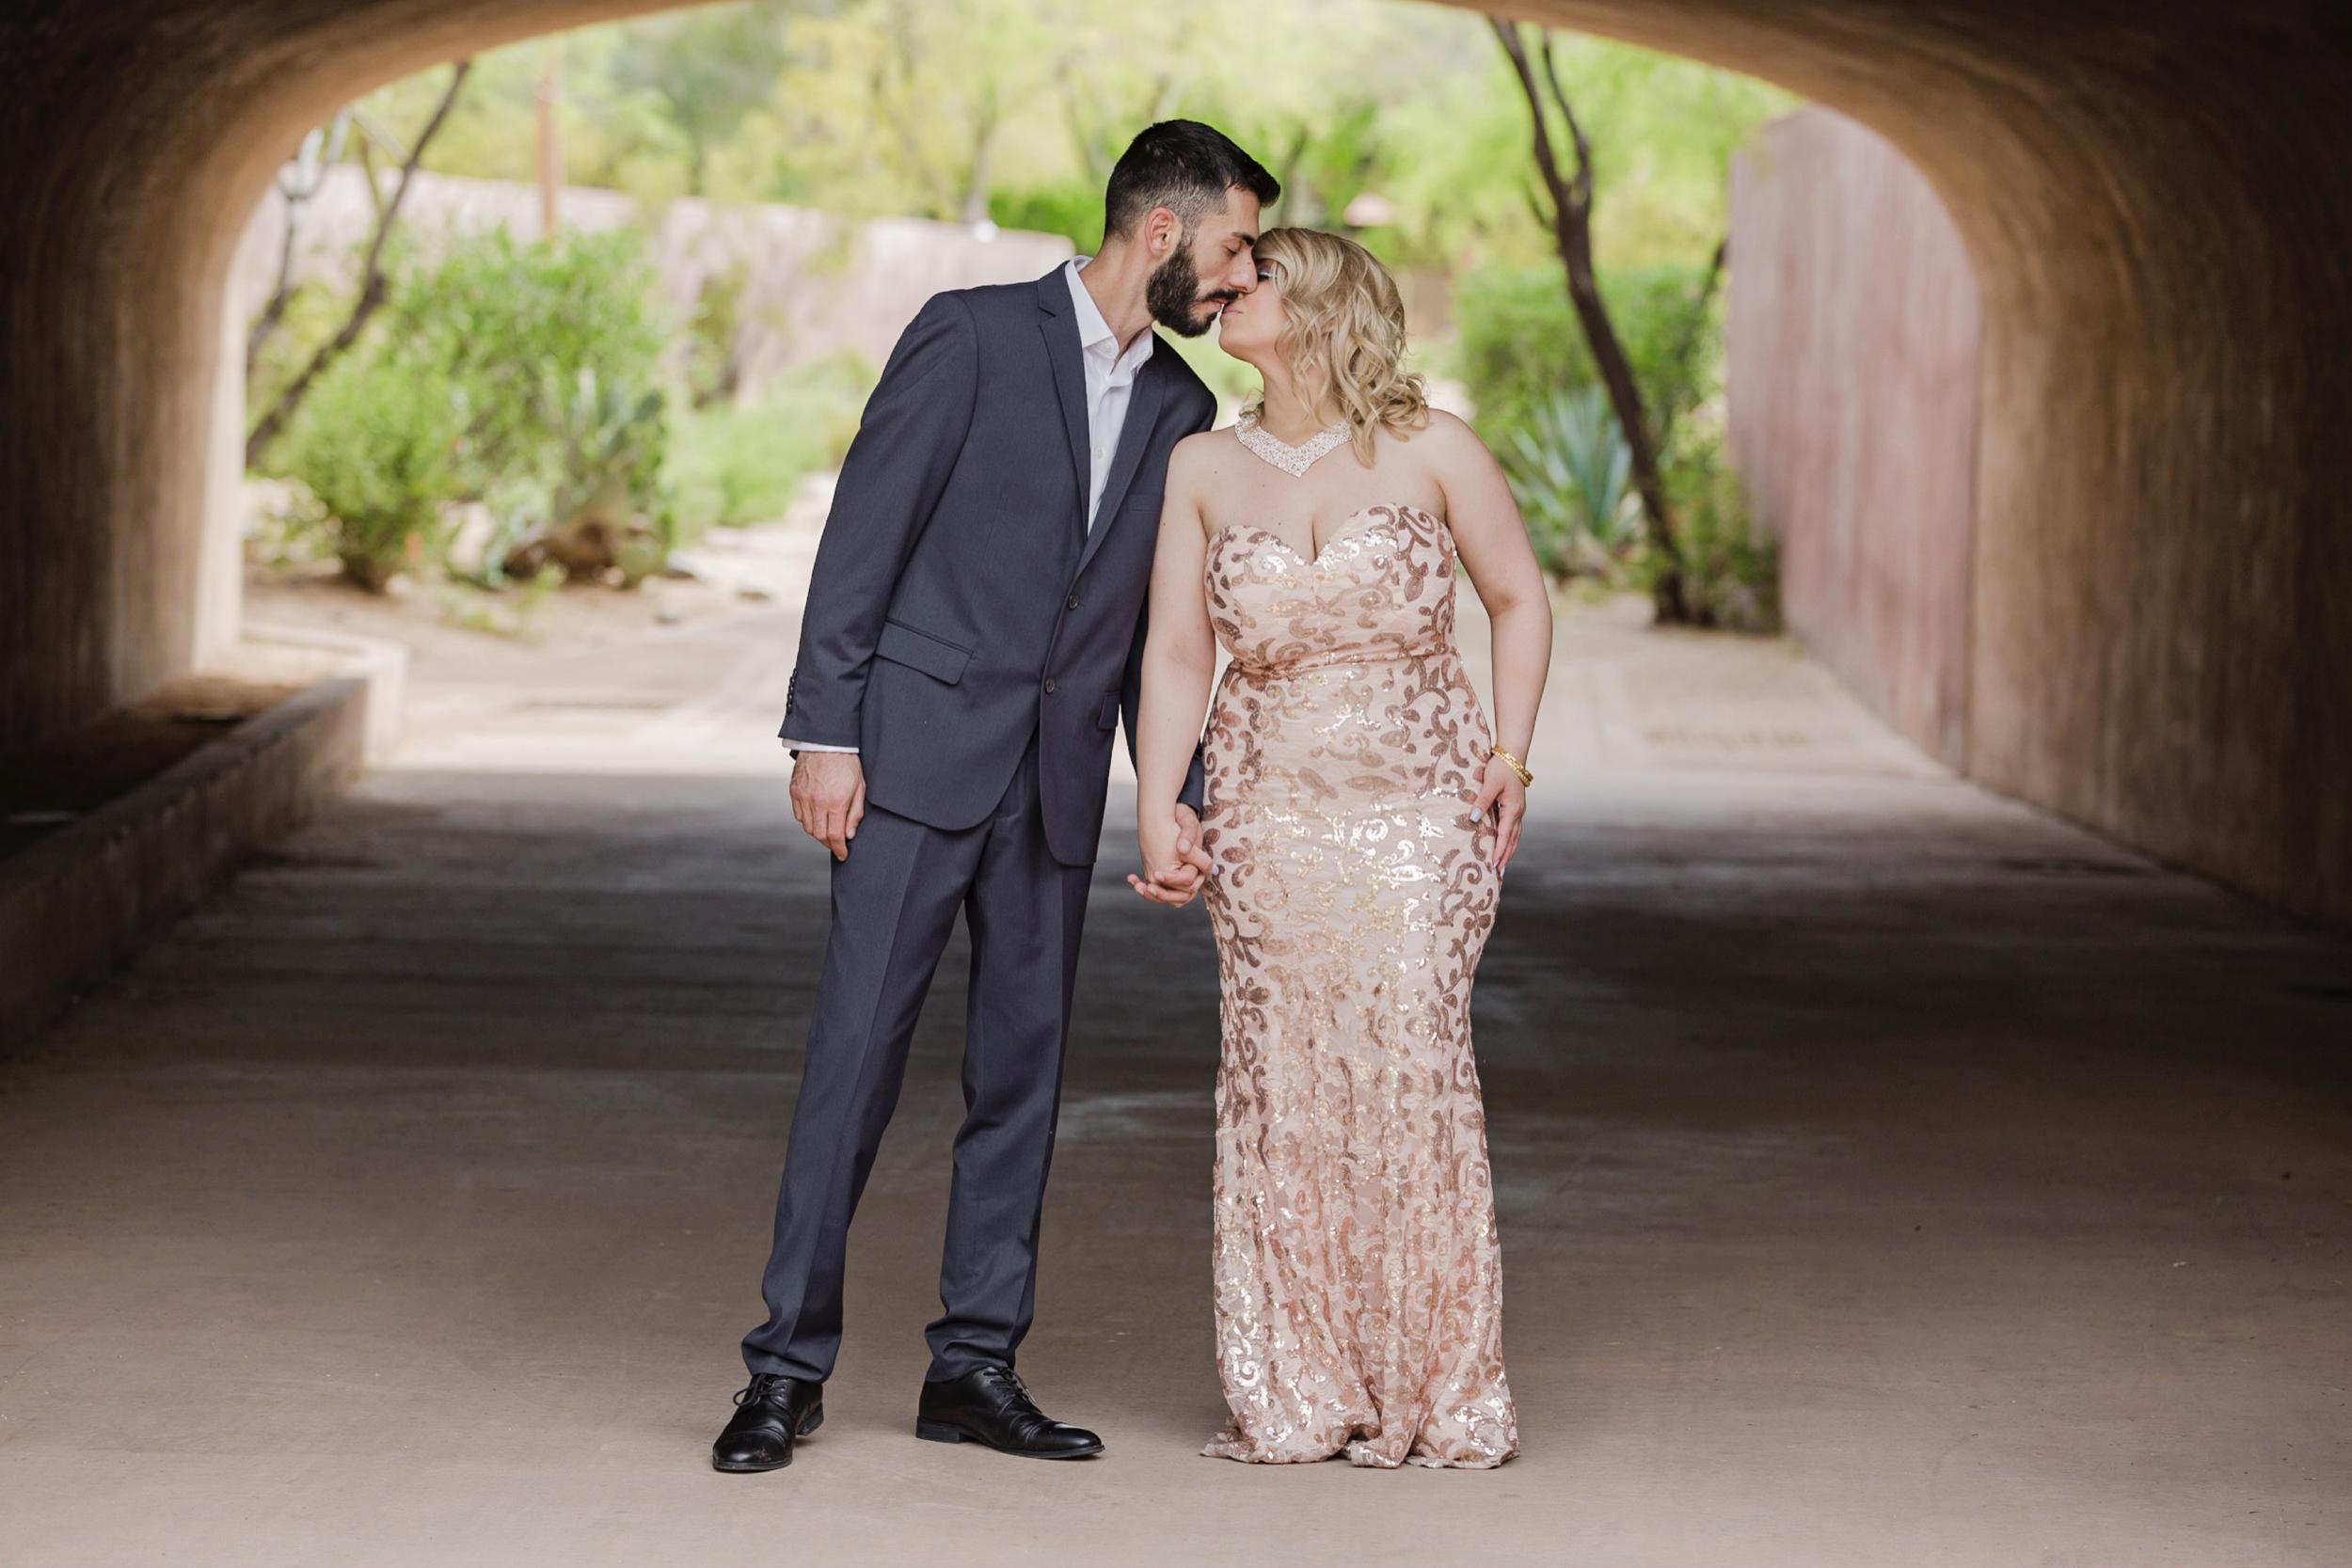 DavidOrrPhotography_Scottsdale-Portraits-04.png